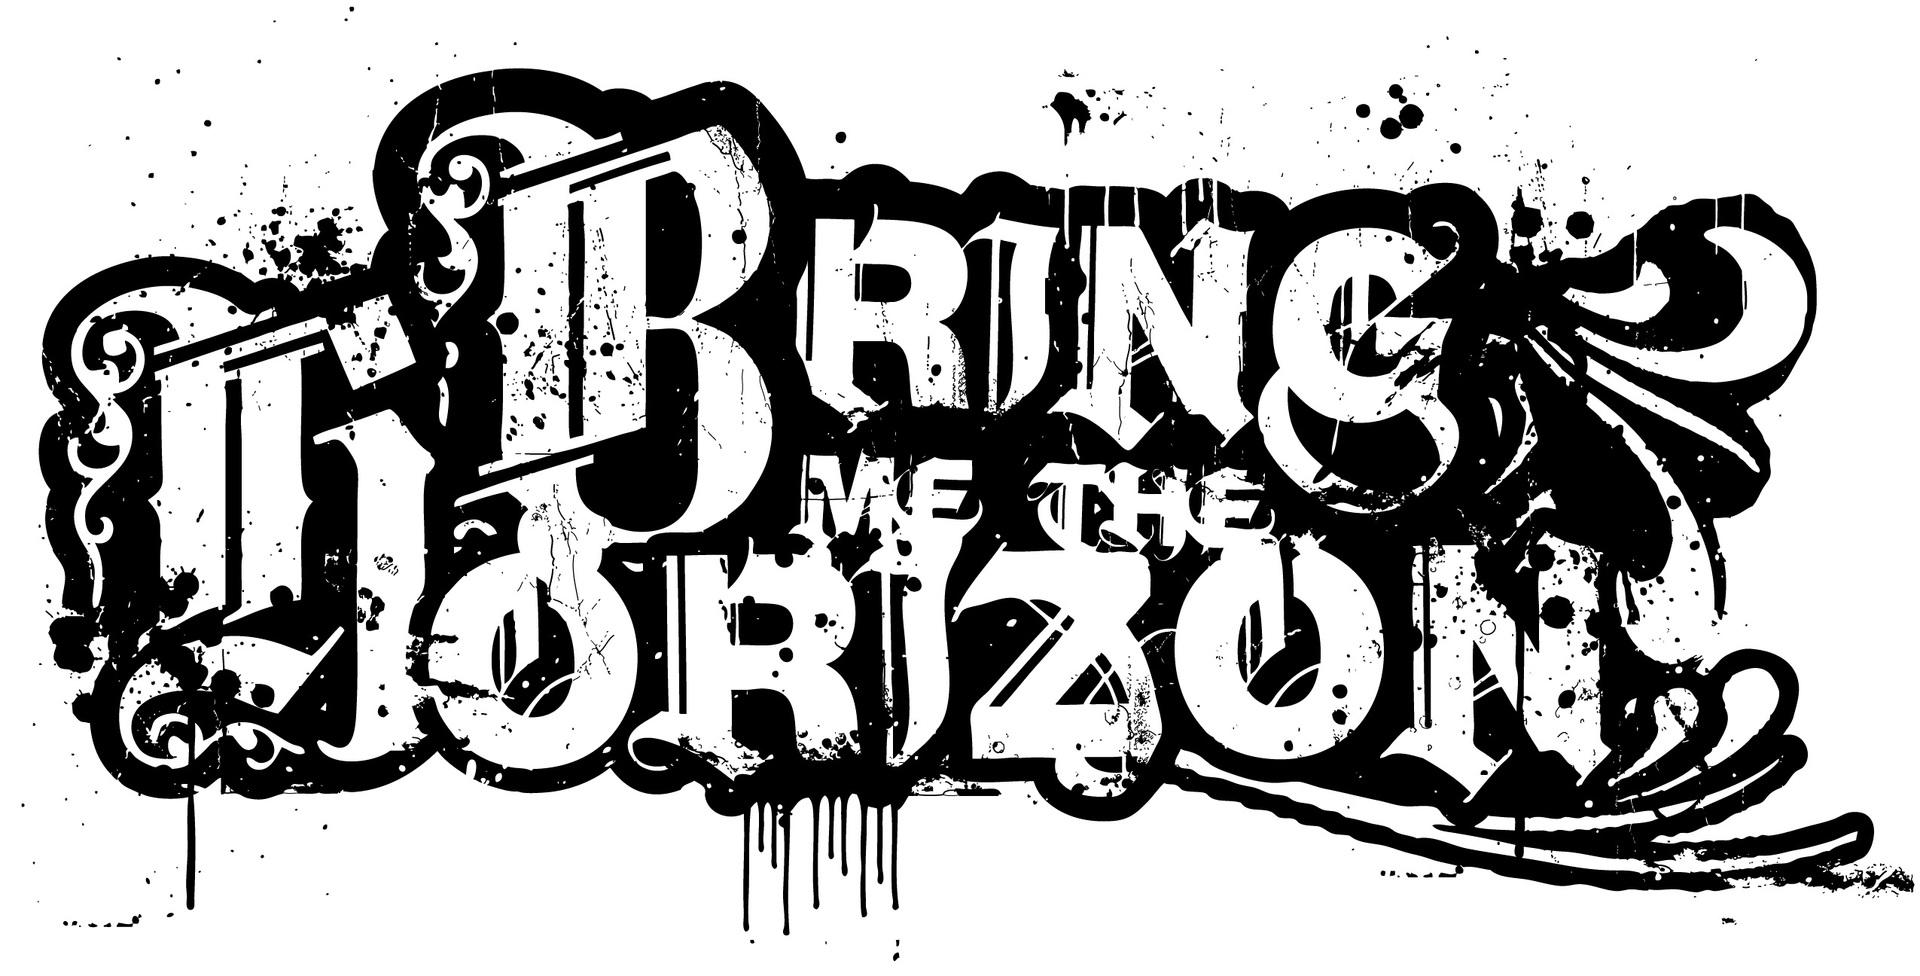 Bring me the horizon wallpaper 15516 1920x1080 px hdwallsource bring me the horizon 15514 buycottarizona